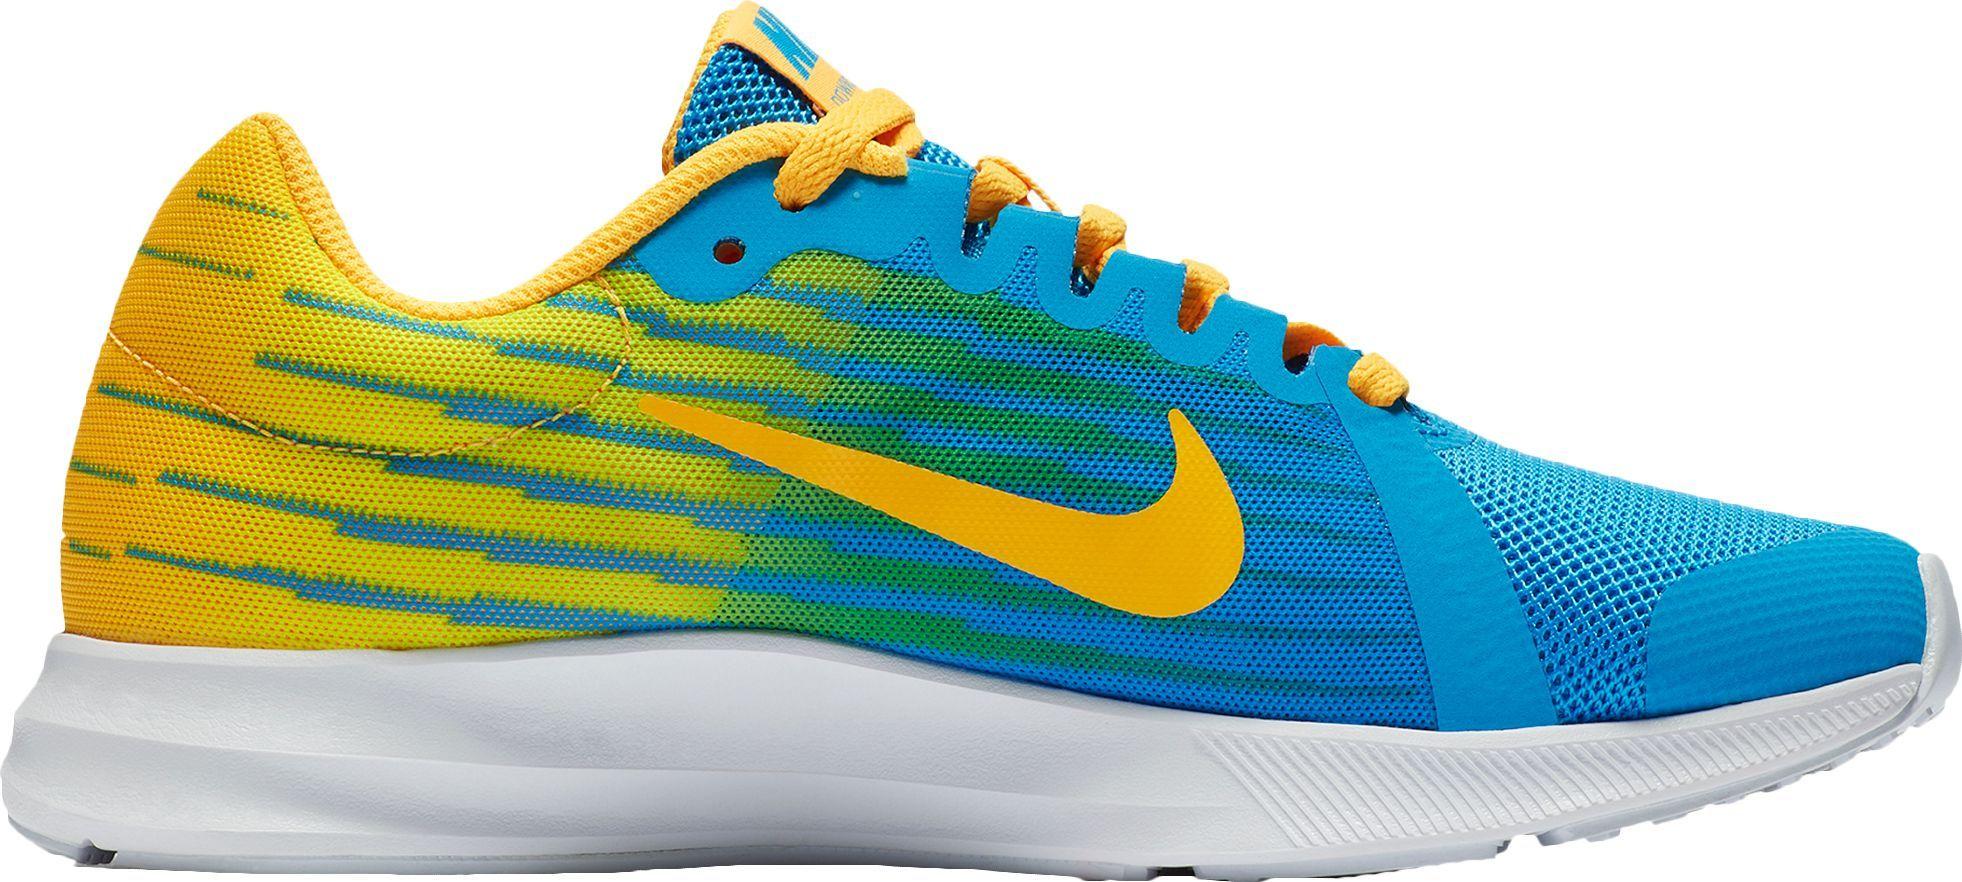 d7b9c8eca8 Nike Kids' Grade School Downshifter 8 Fade Running Shoes, Boy's, Size: 6.0,  Orange